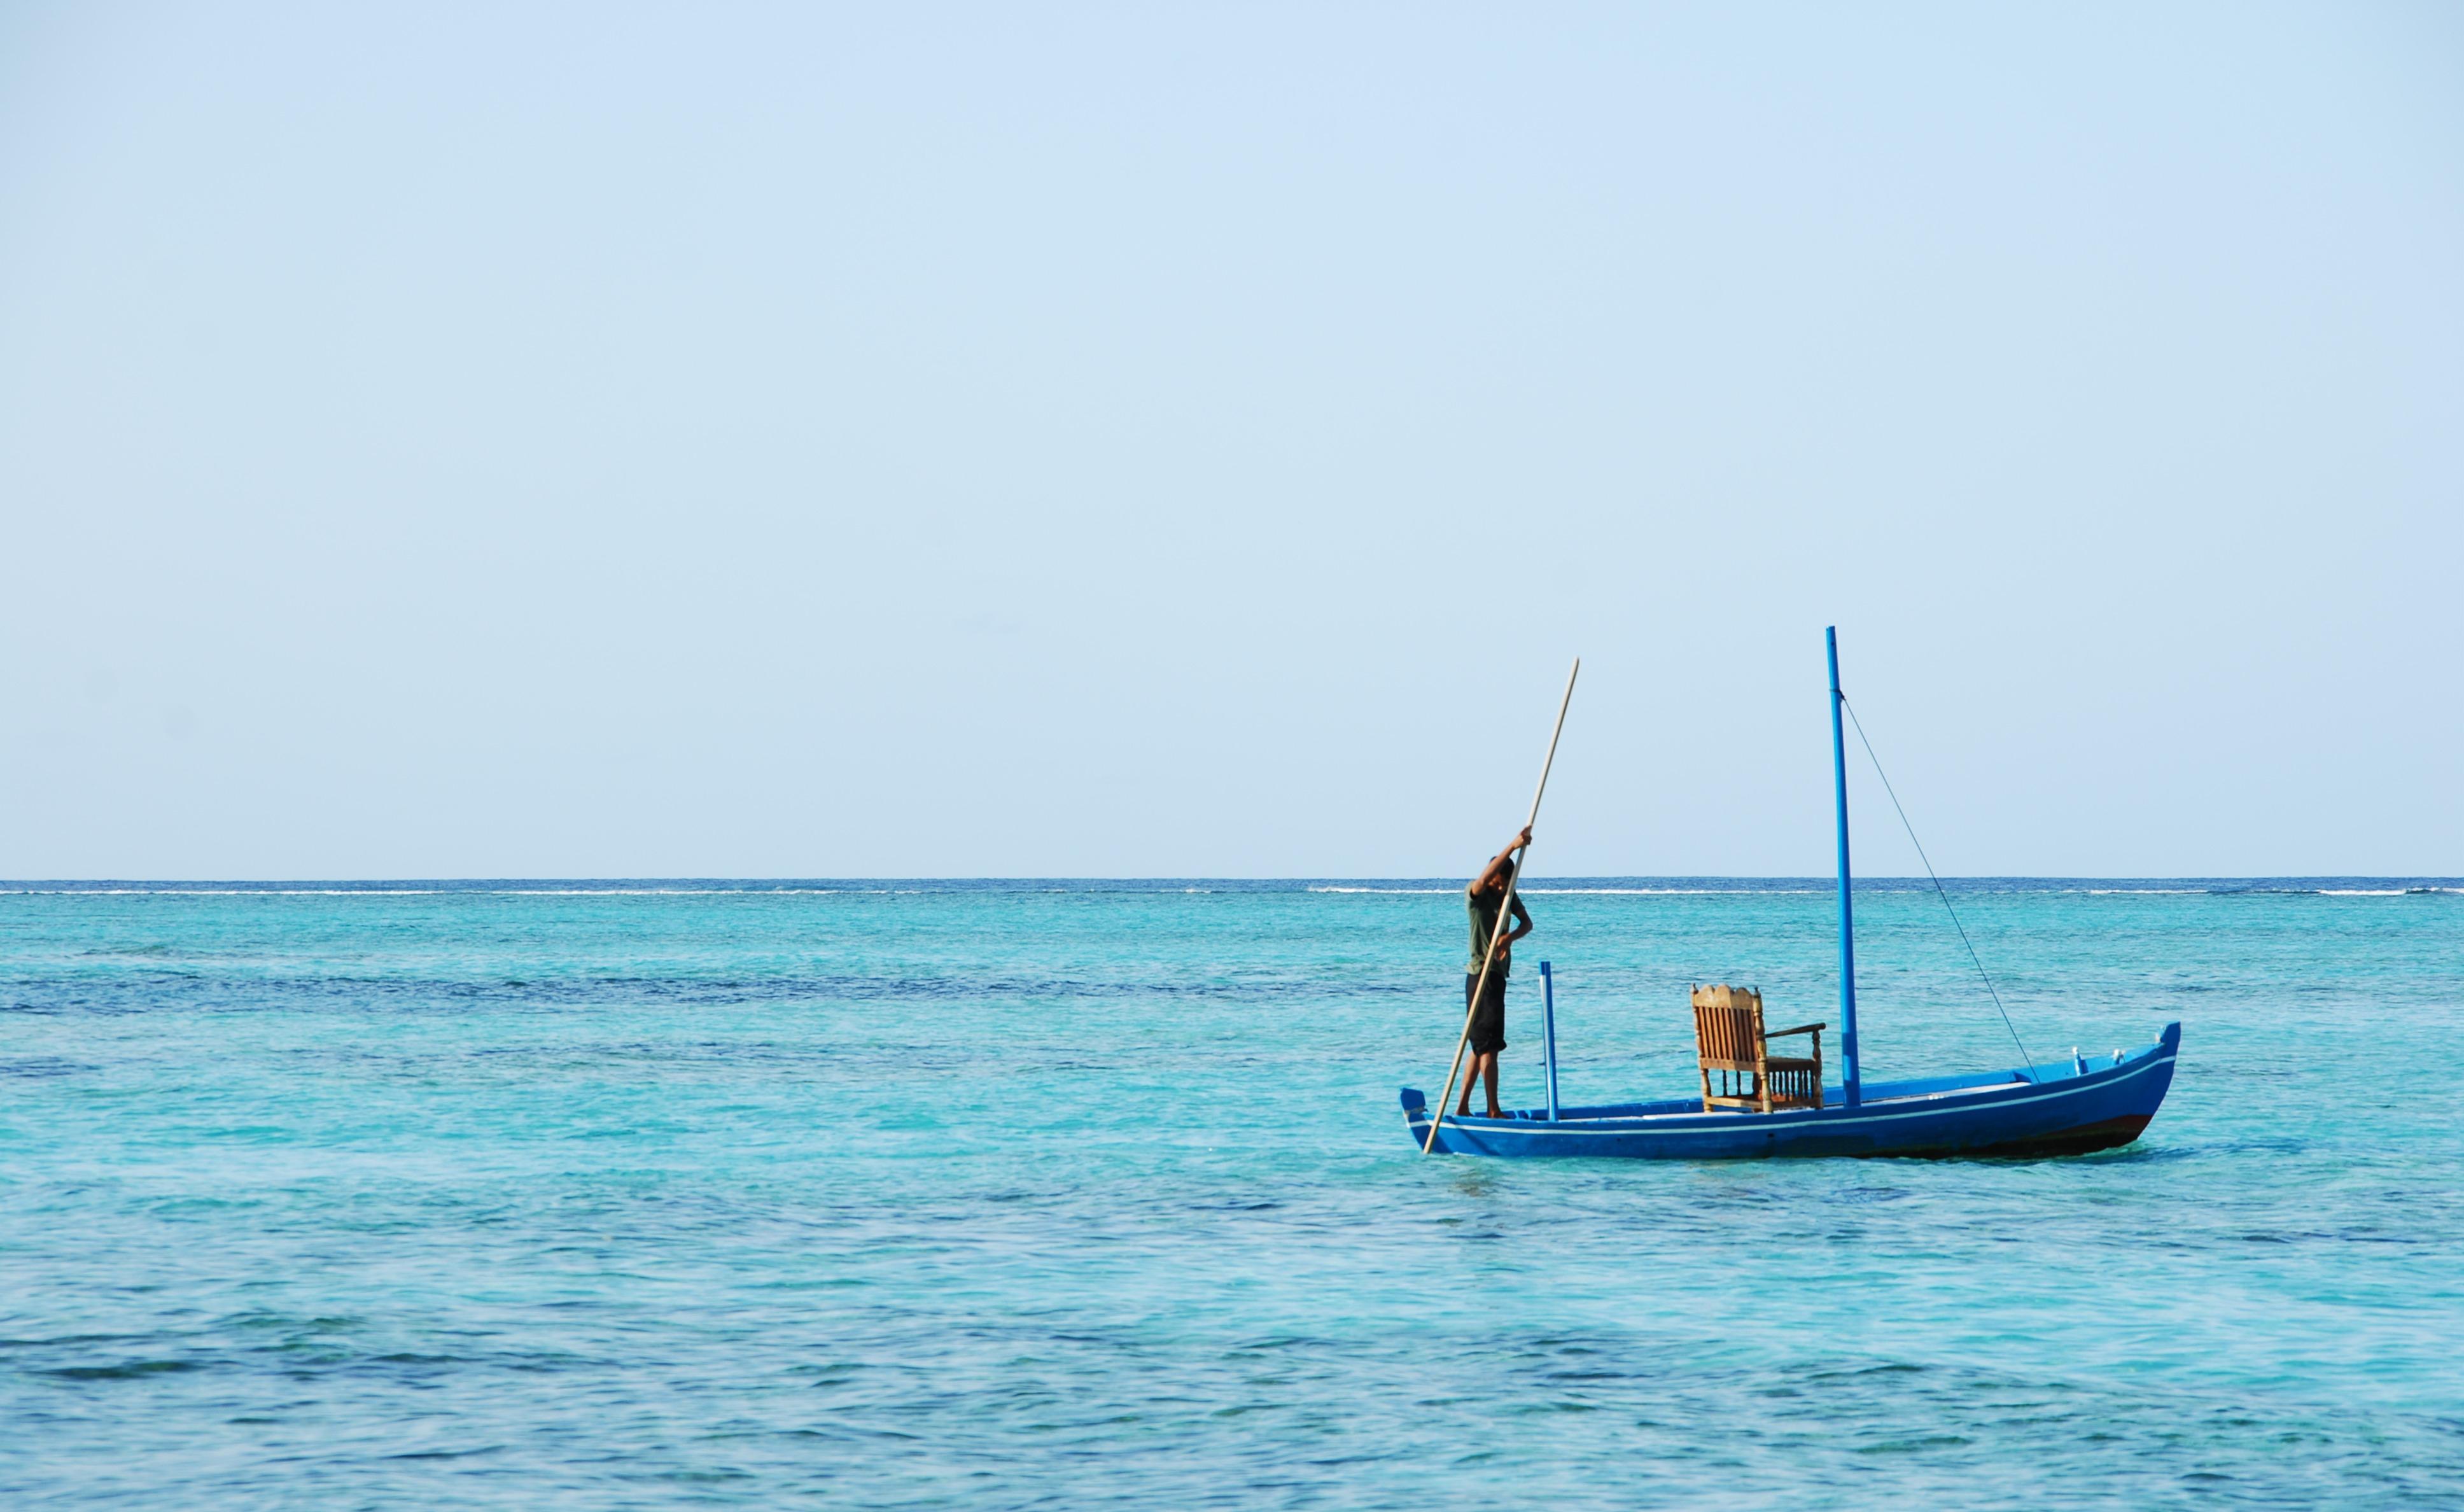 Typical Maldivian boat on blue ocean